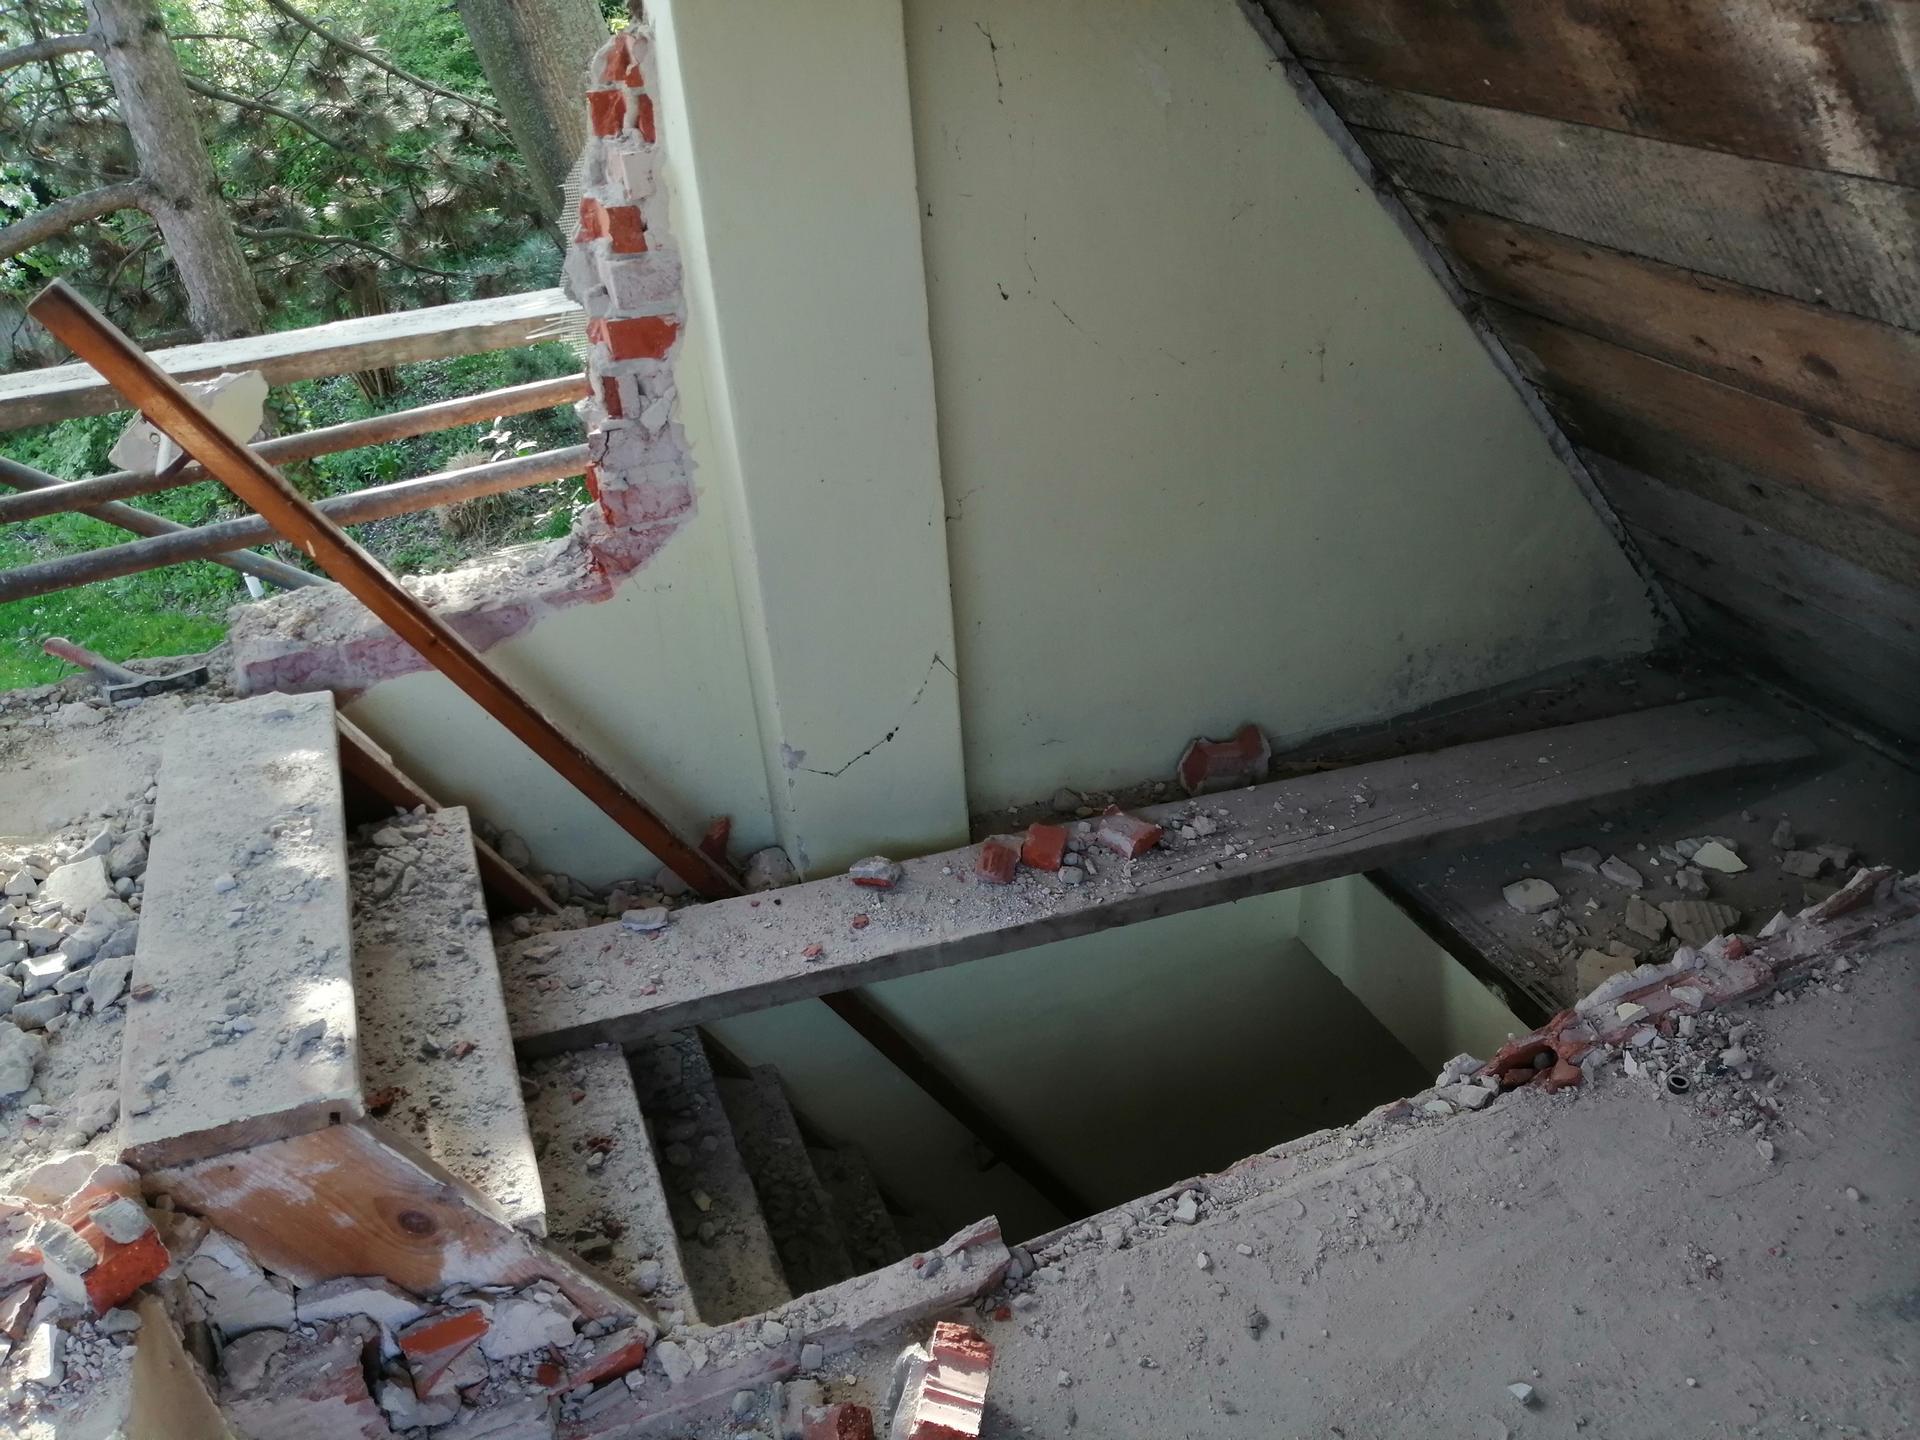 Prestavba podkrovia zo sedlovo valbovej na sedlovú strechu. - Obrázok č. 49